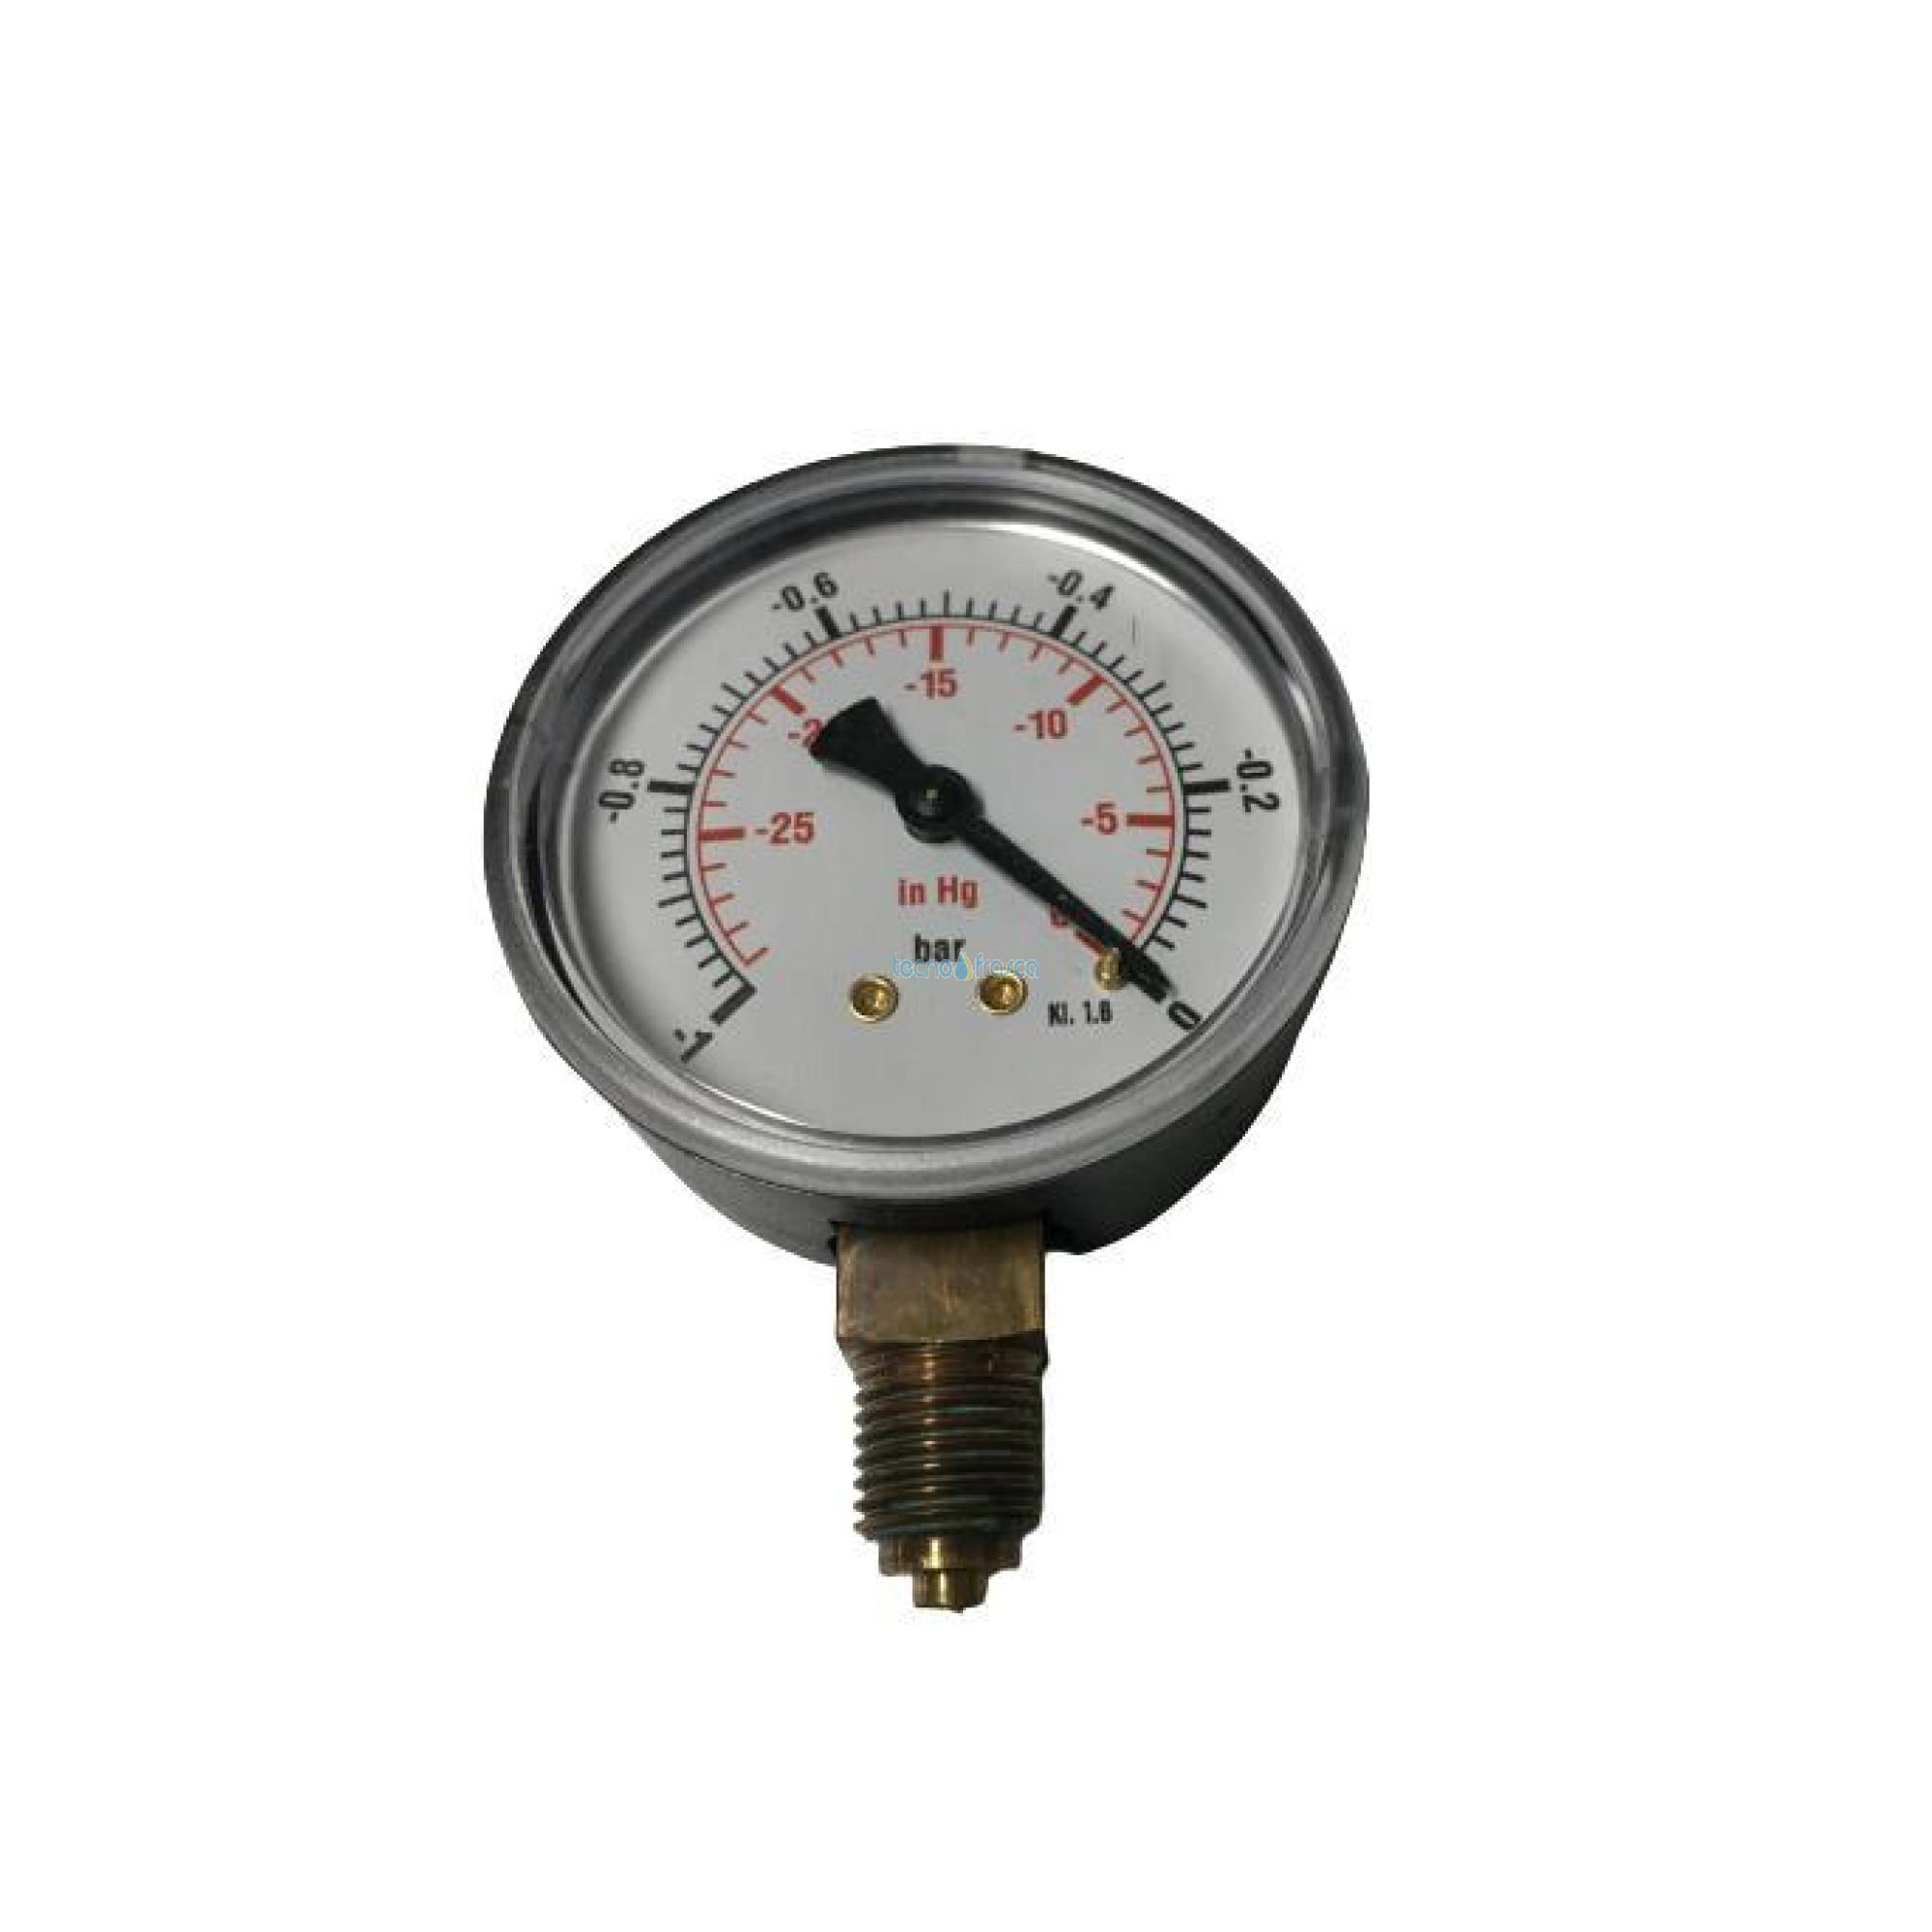 "Vuotometro manovuotometro radiale 1/4"" diam.63 sc.-1/0bar uen110533"